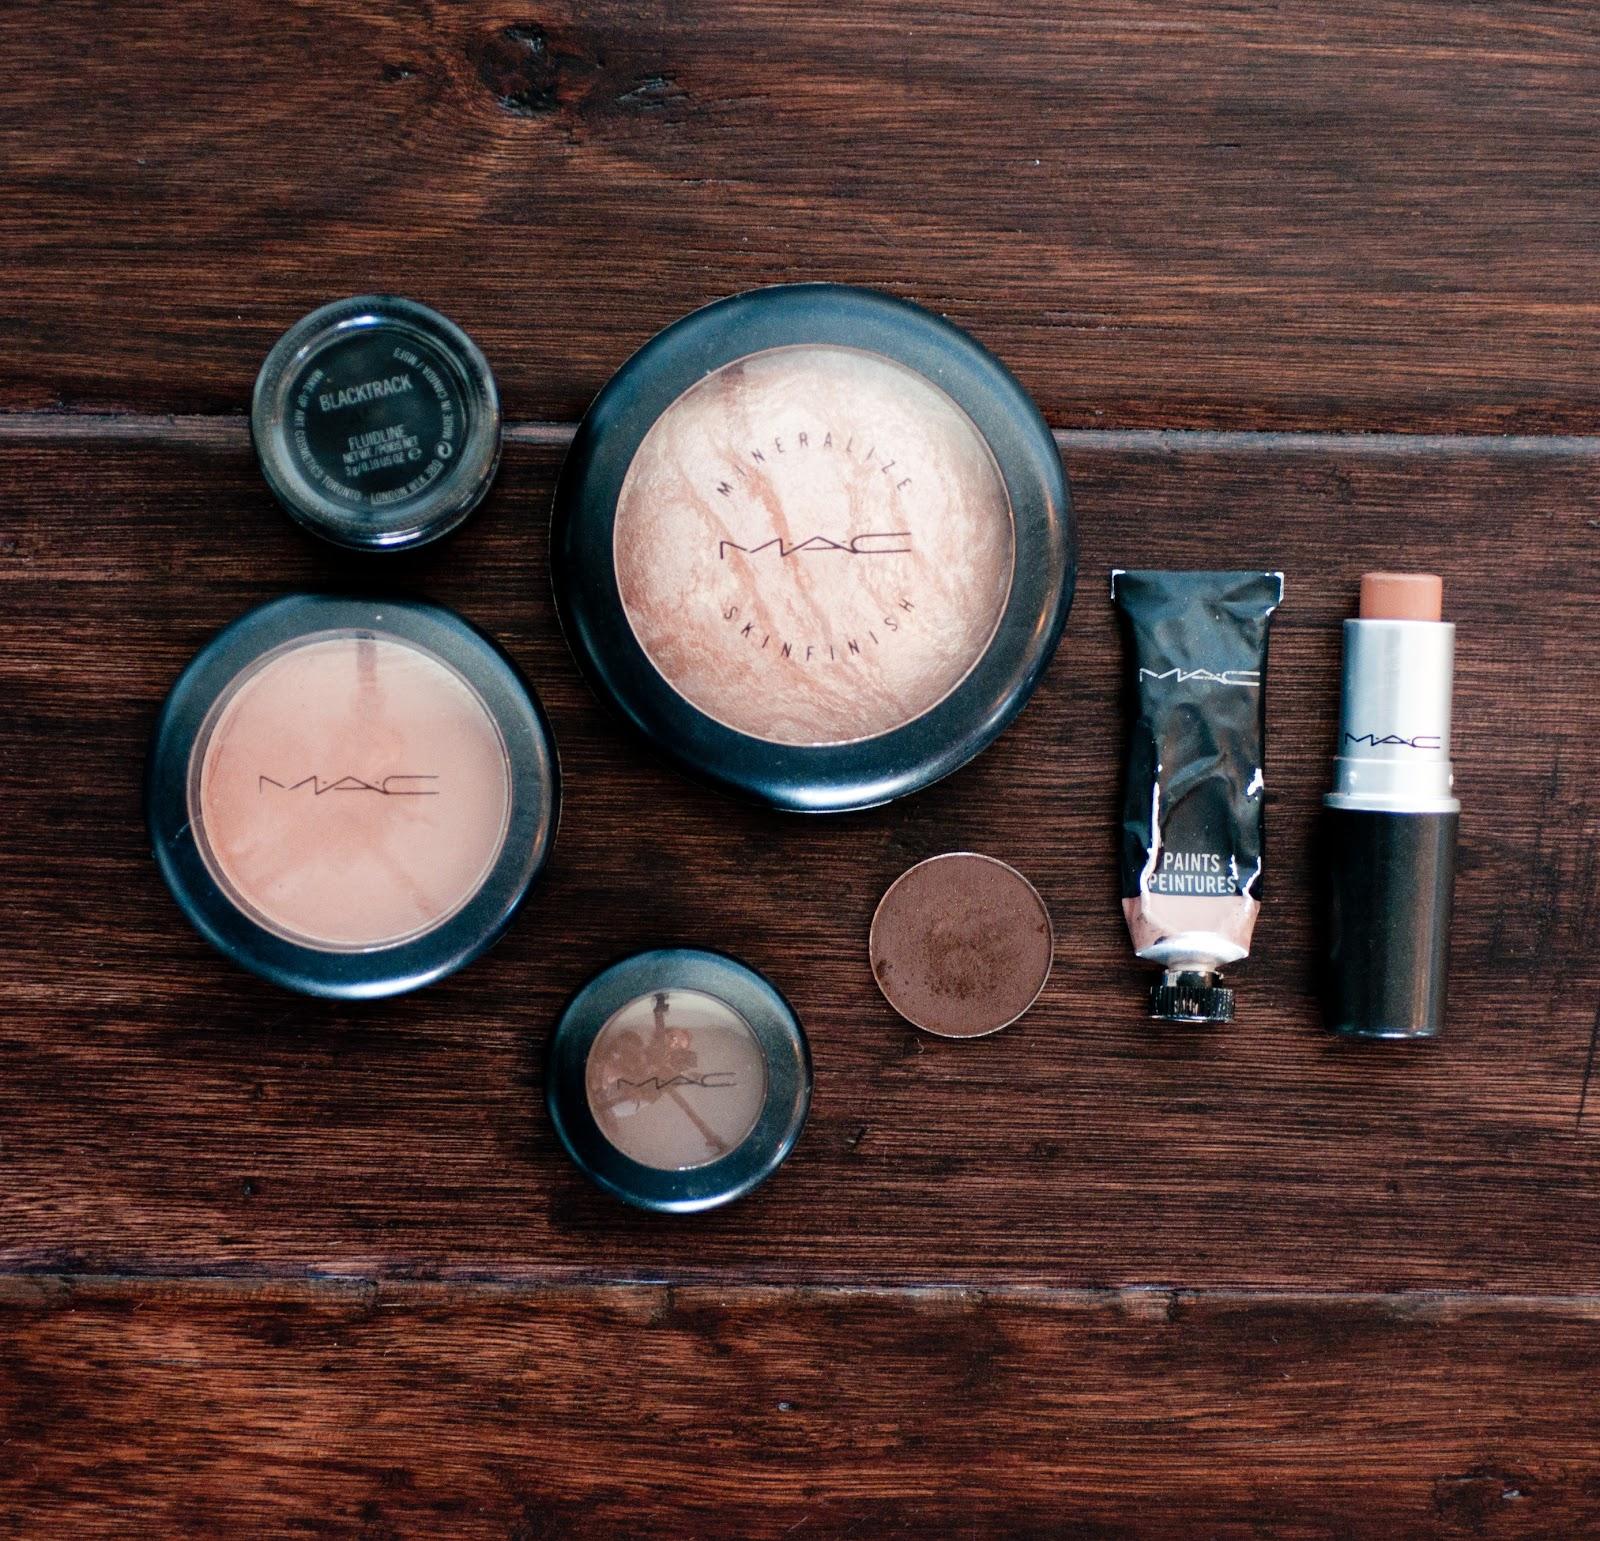 blush, fluid line, black track, harmony, brozner, mac, mac make up review, mac makeup, eyeshadow, lipstick, hard wood floor, dark hardwood